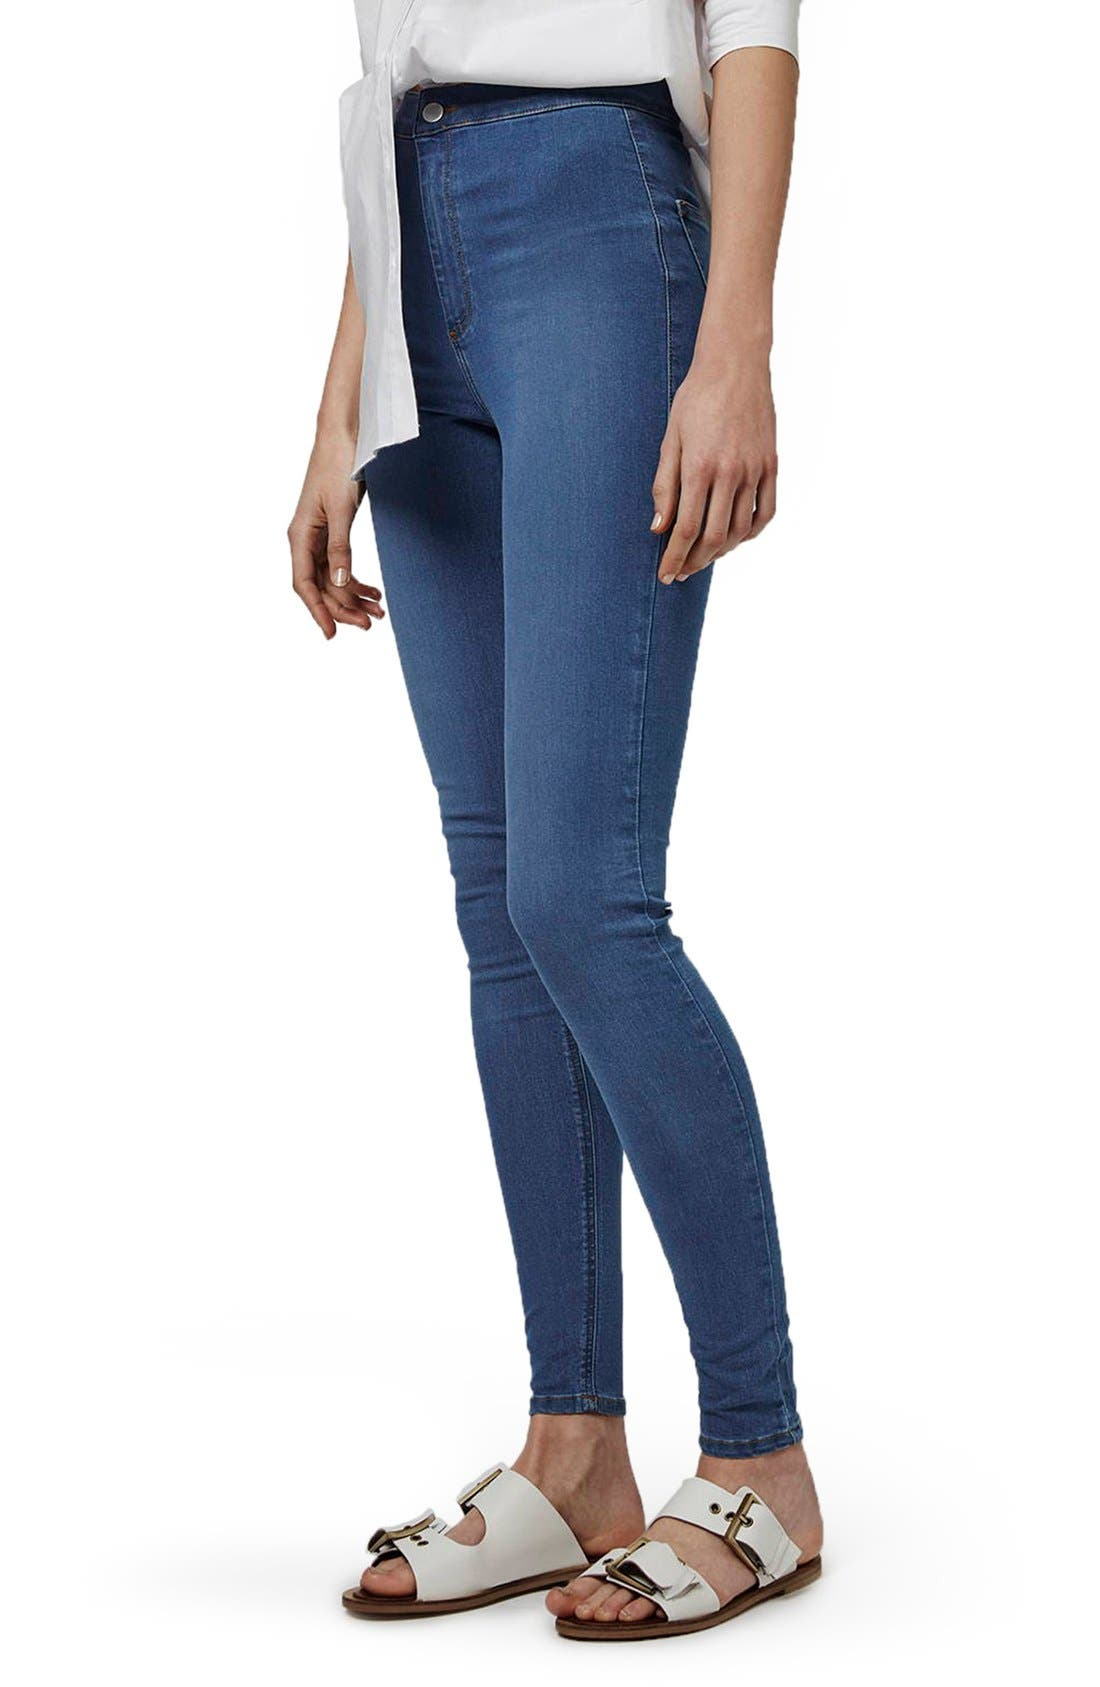 'Joni' High Waist Skinny Jeans,                             Main thumbnail 1, color,                             400